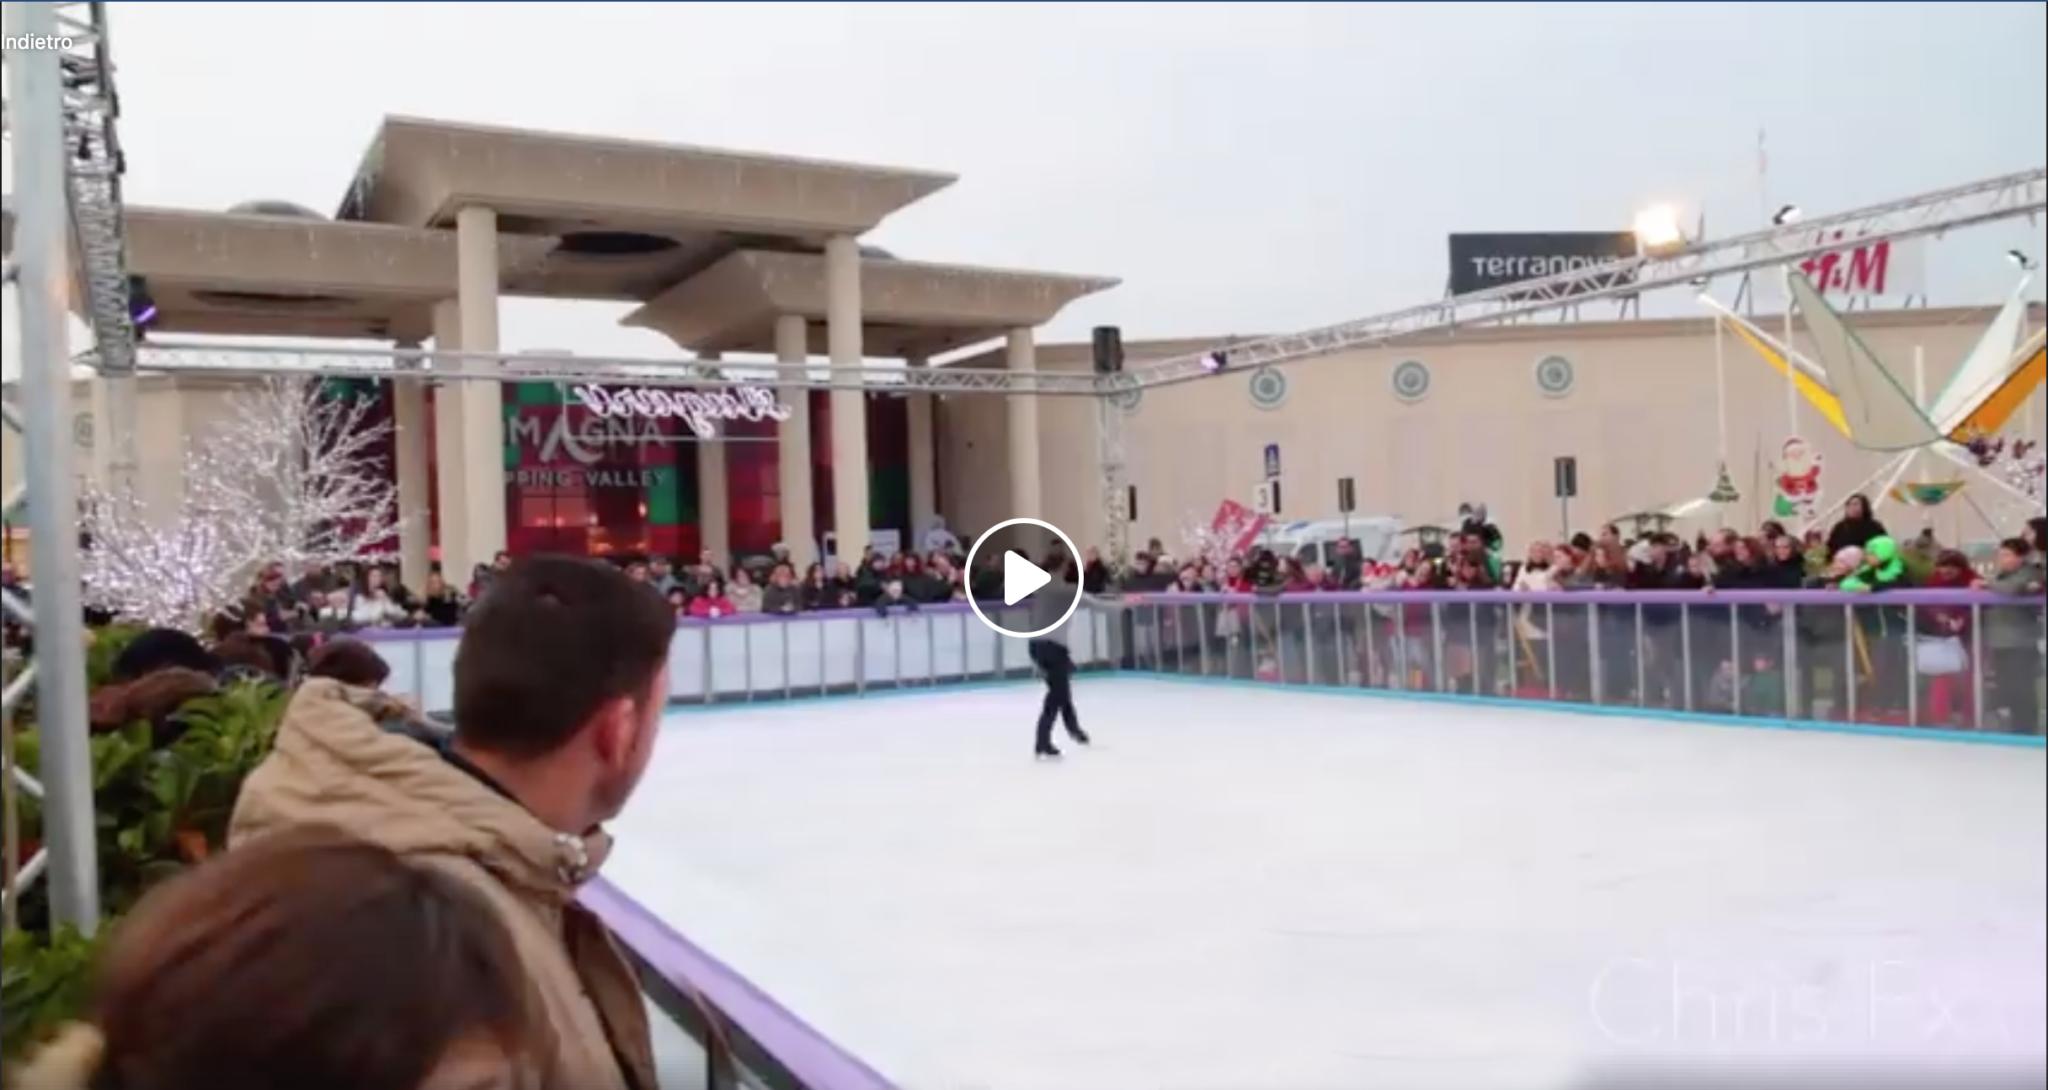 Ricci Ice Village 2018